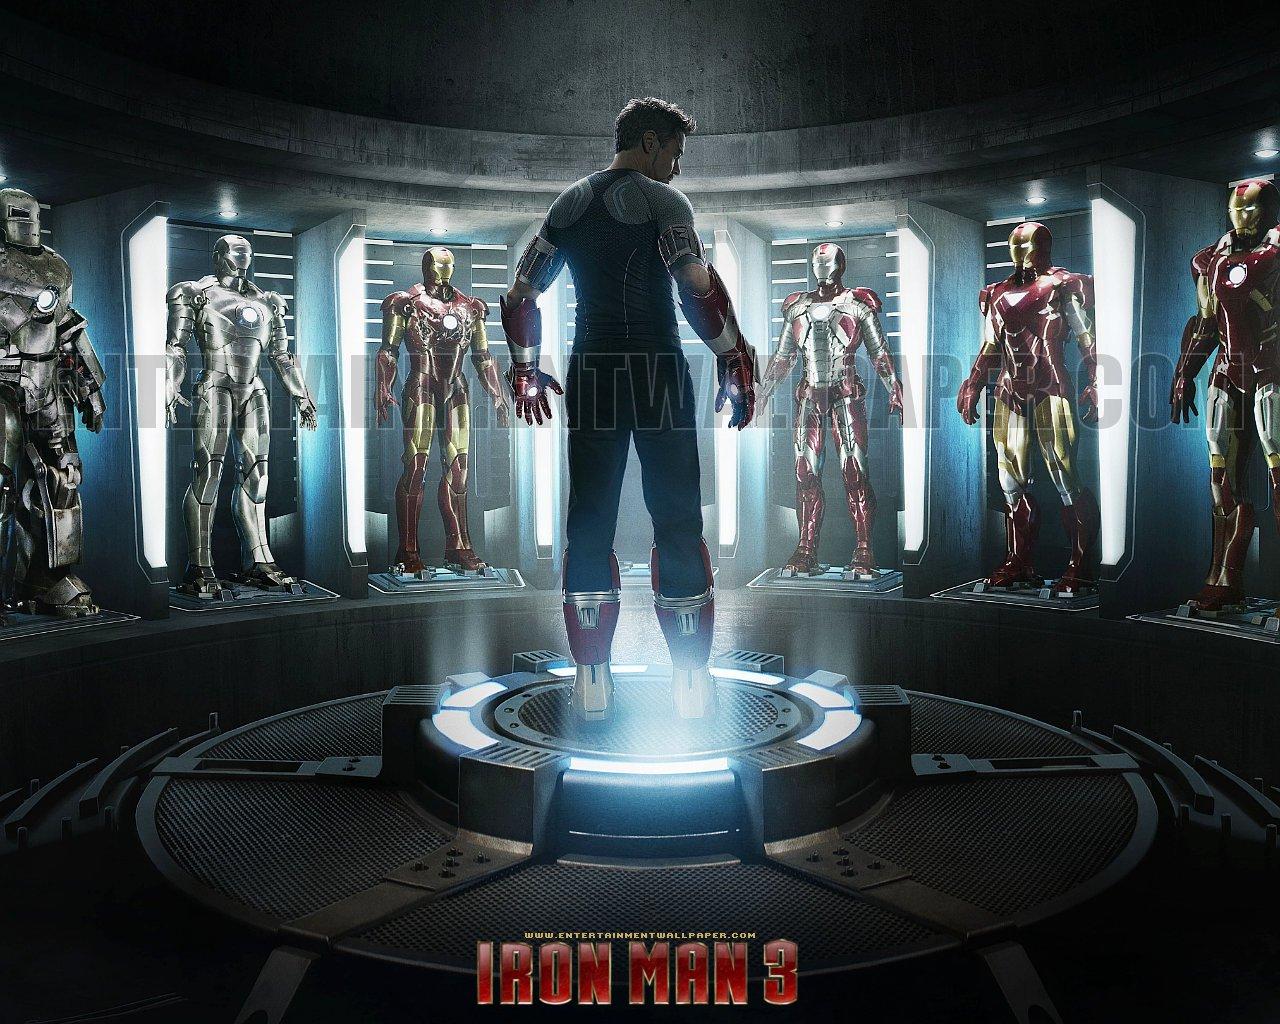 Iron Man 3 2013 Iron Man Wallpaper 33873845 Fanpop